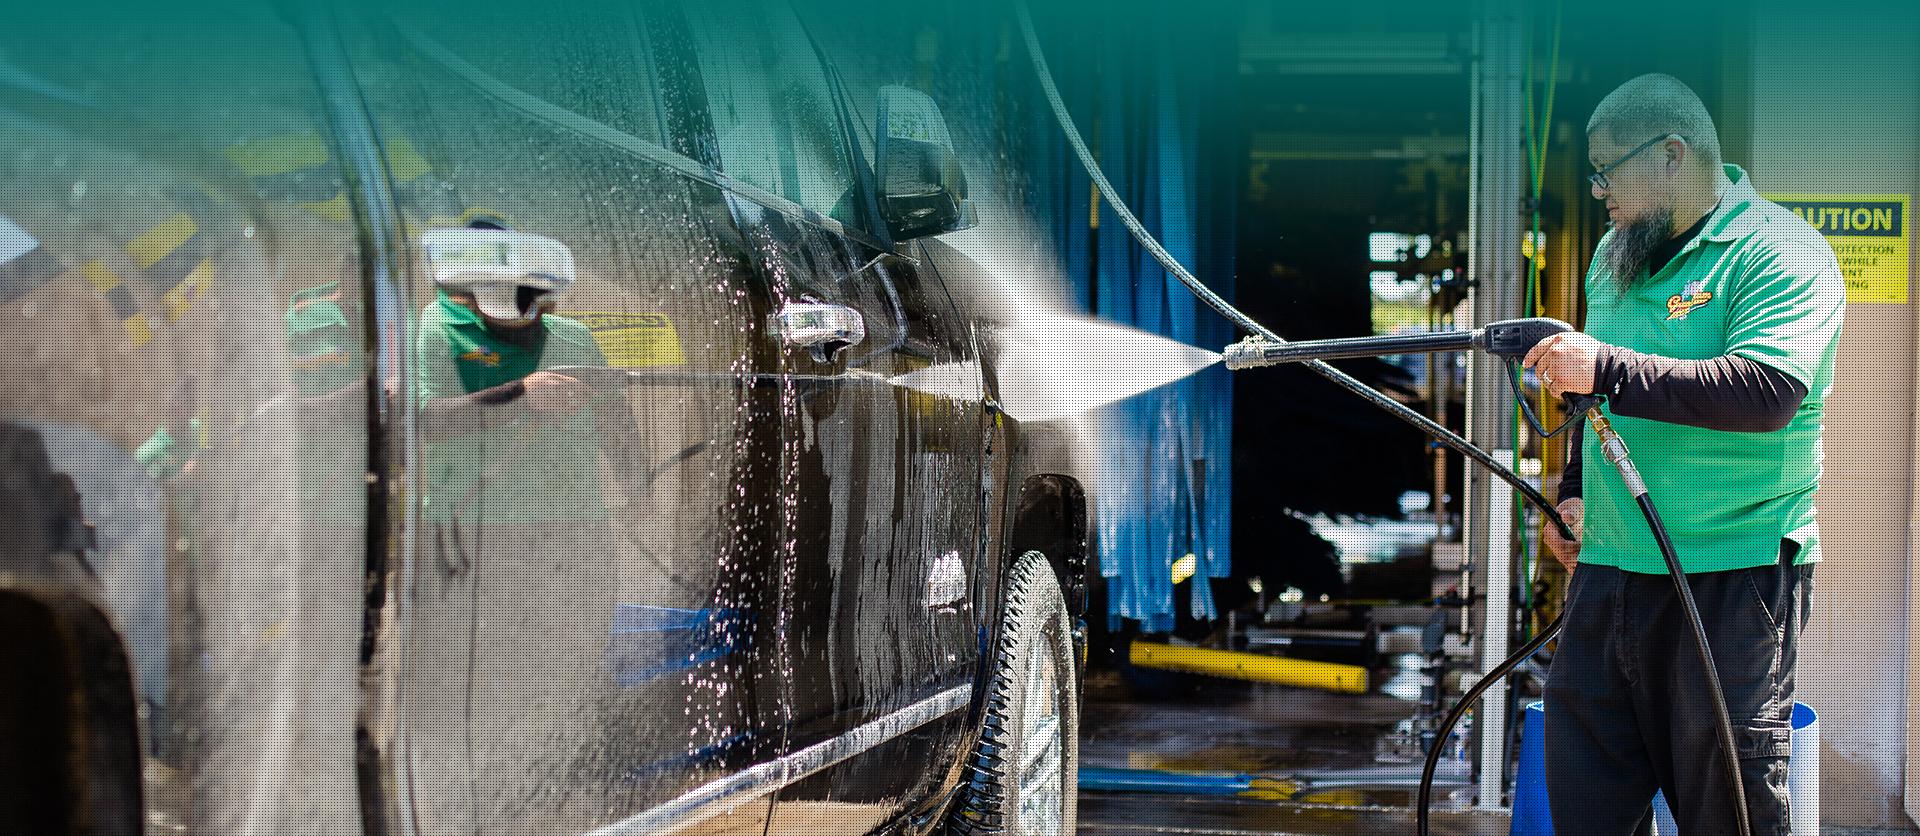 Grand slam car wash first slide solutioingenieria Gallery